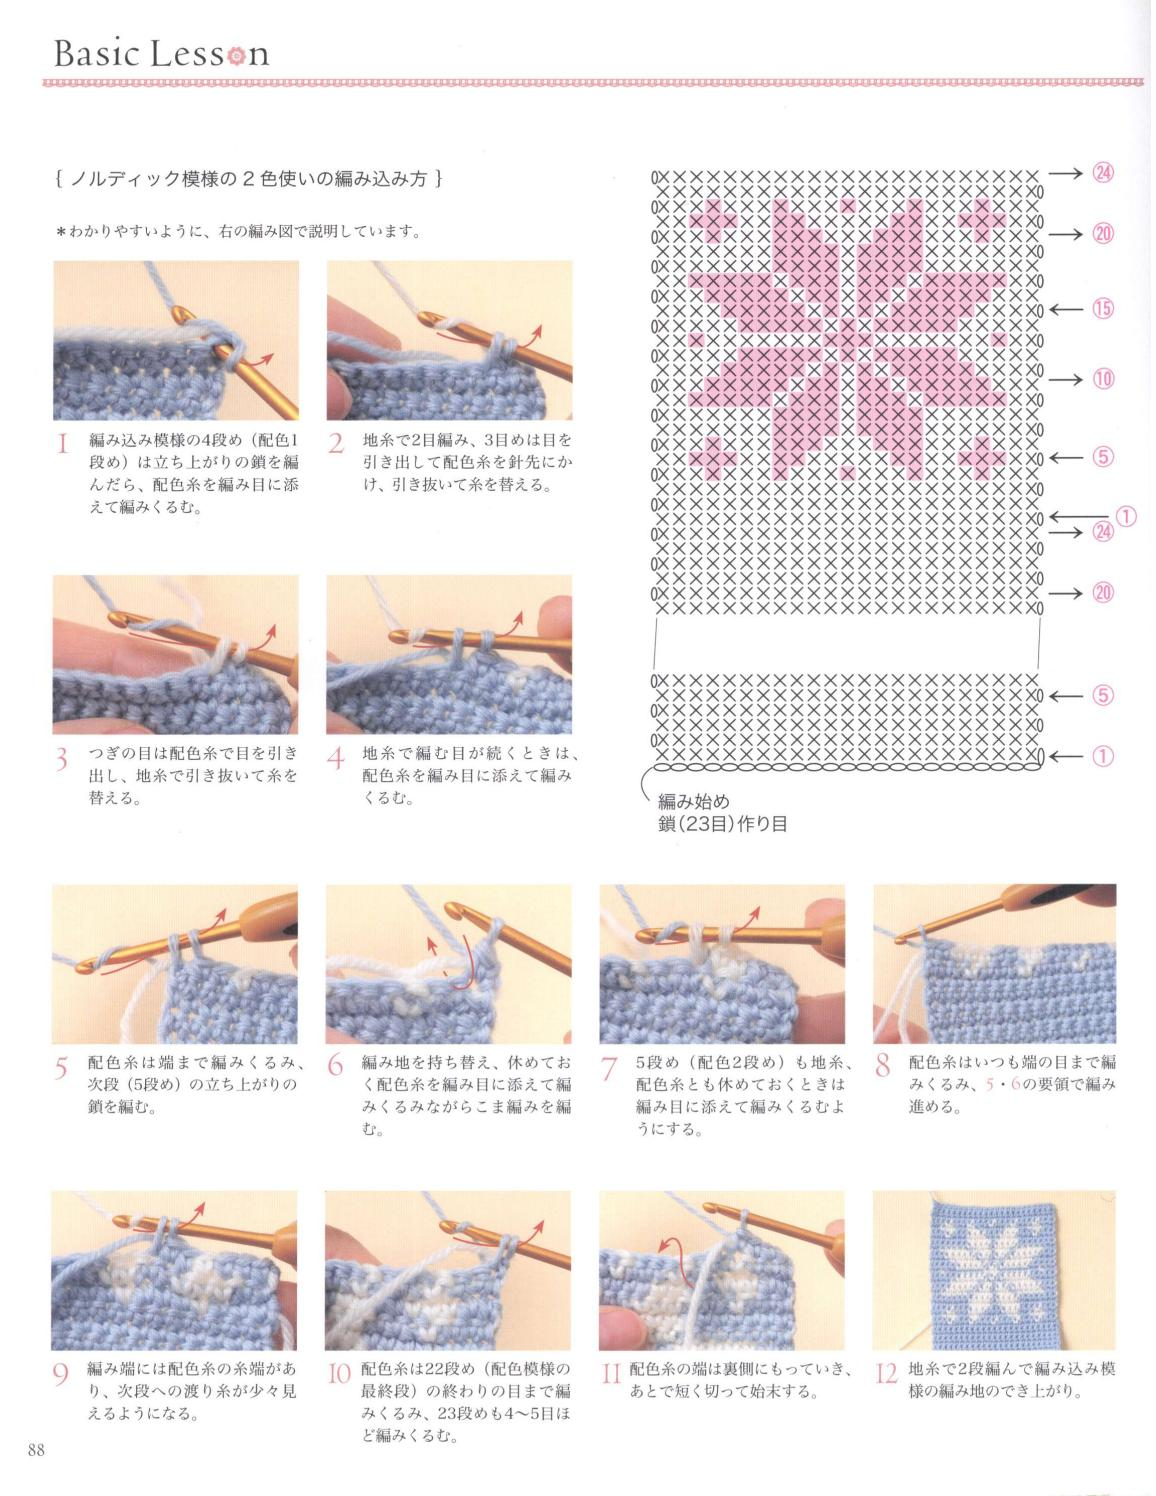 Asahi original crochet best selection 2012 page 88